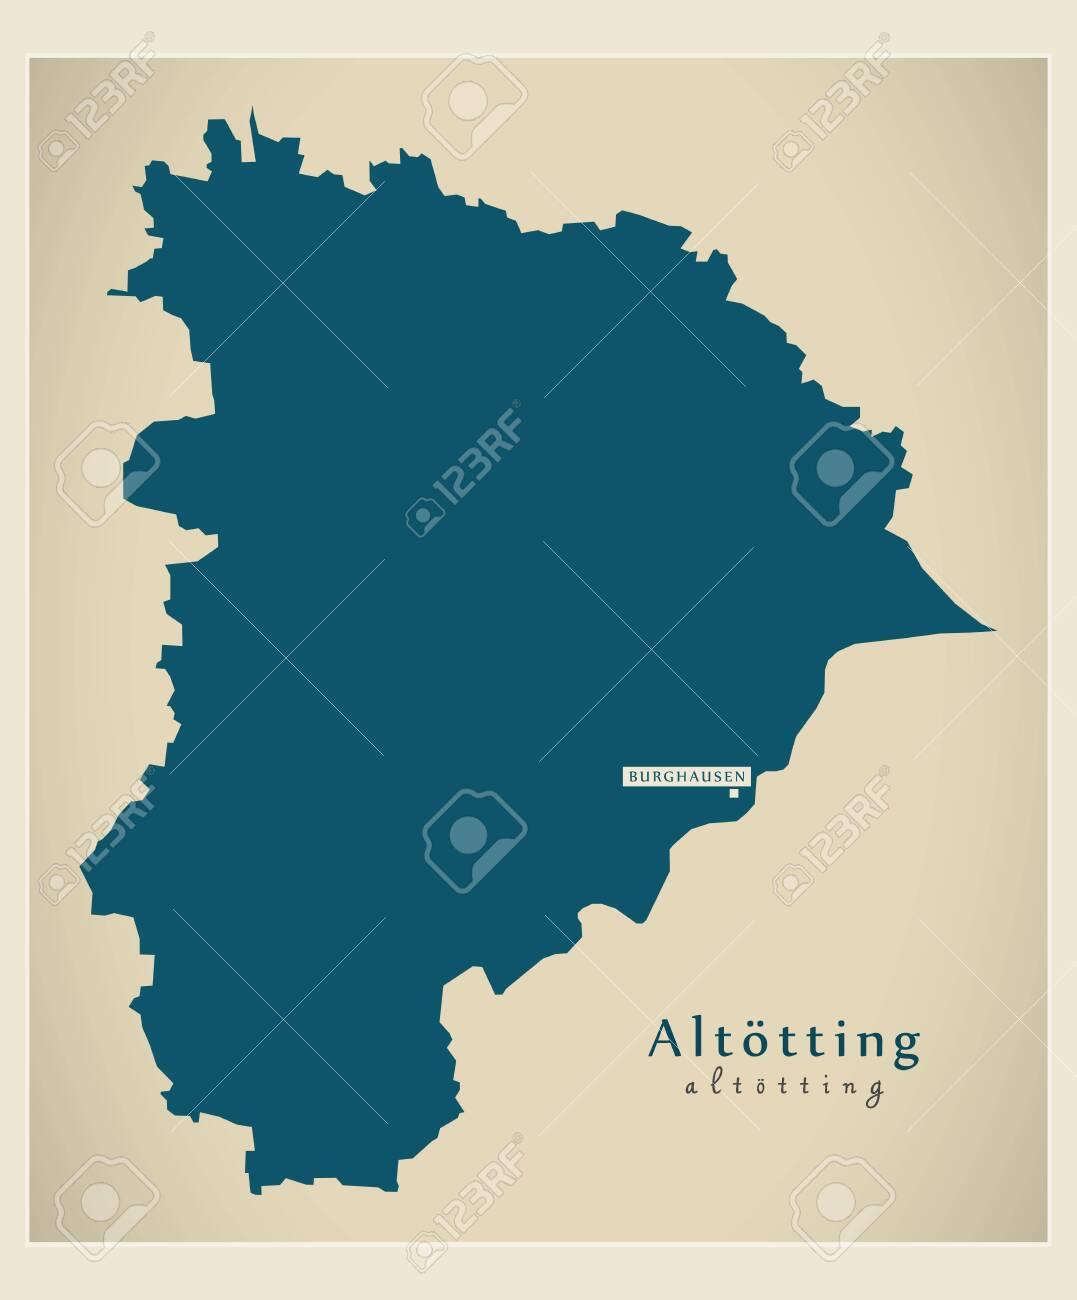 Modern Map - Altoetting county of Bavaria DE - 122852706